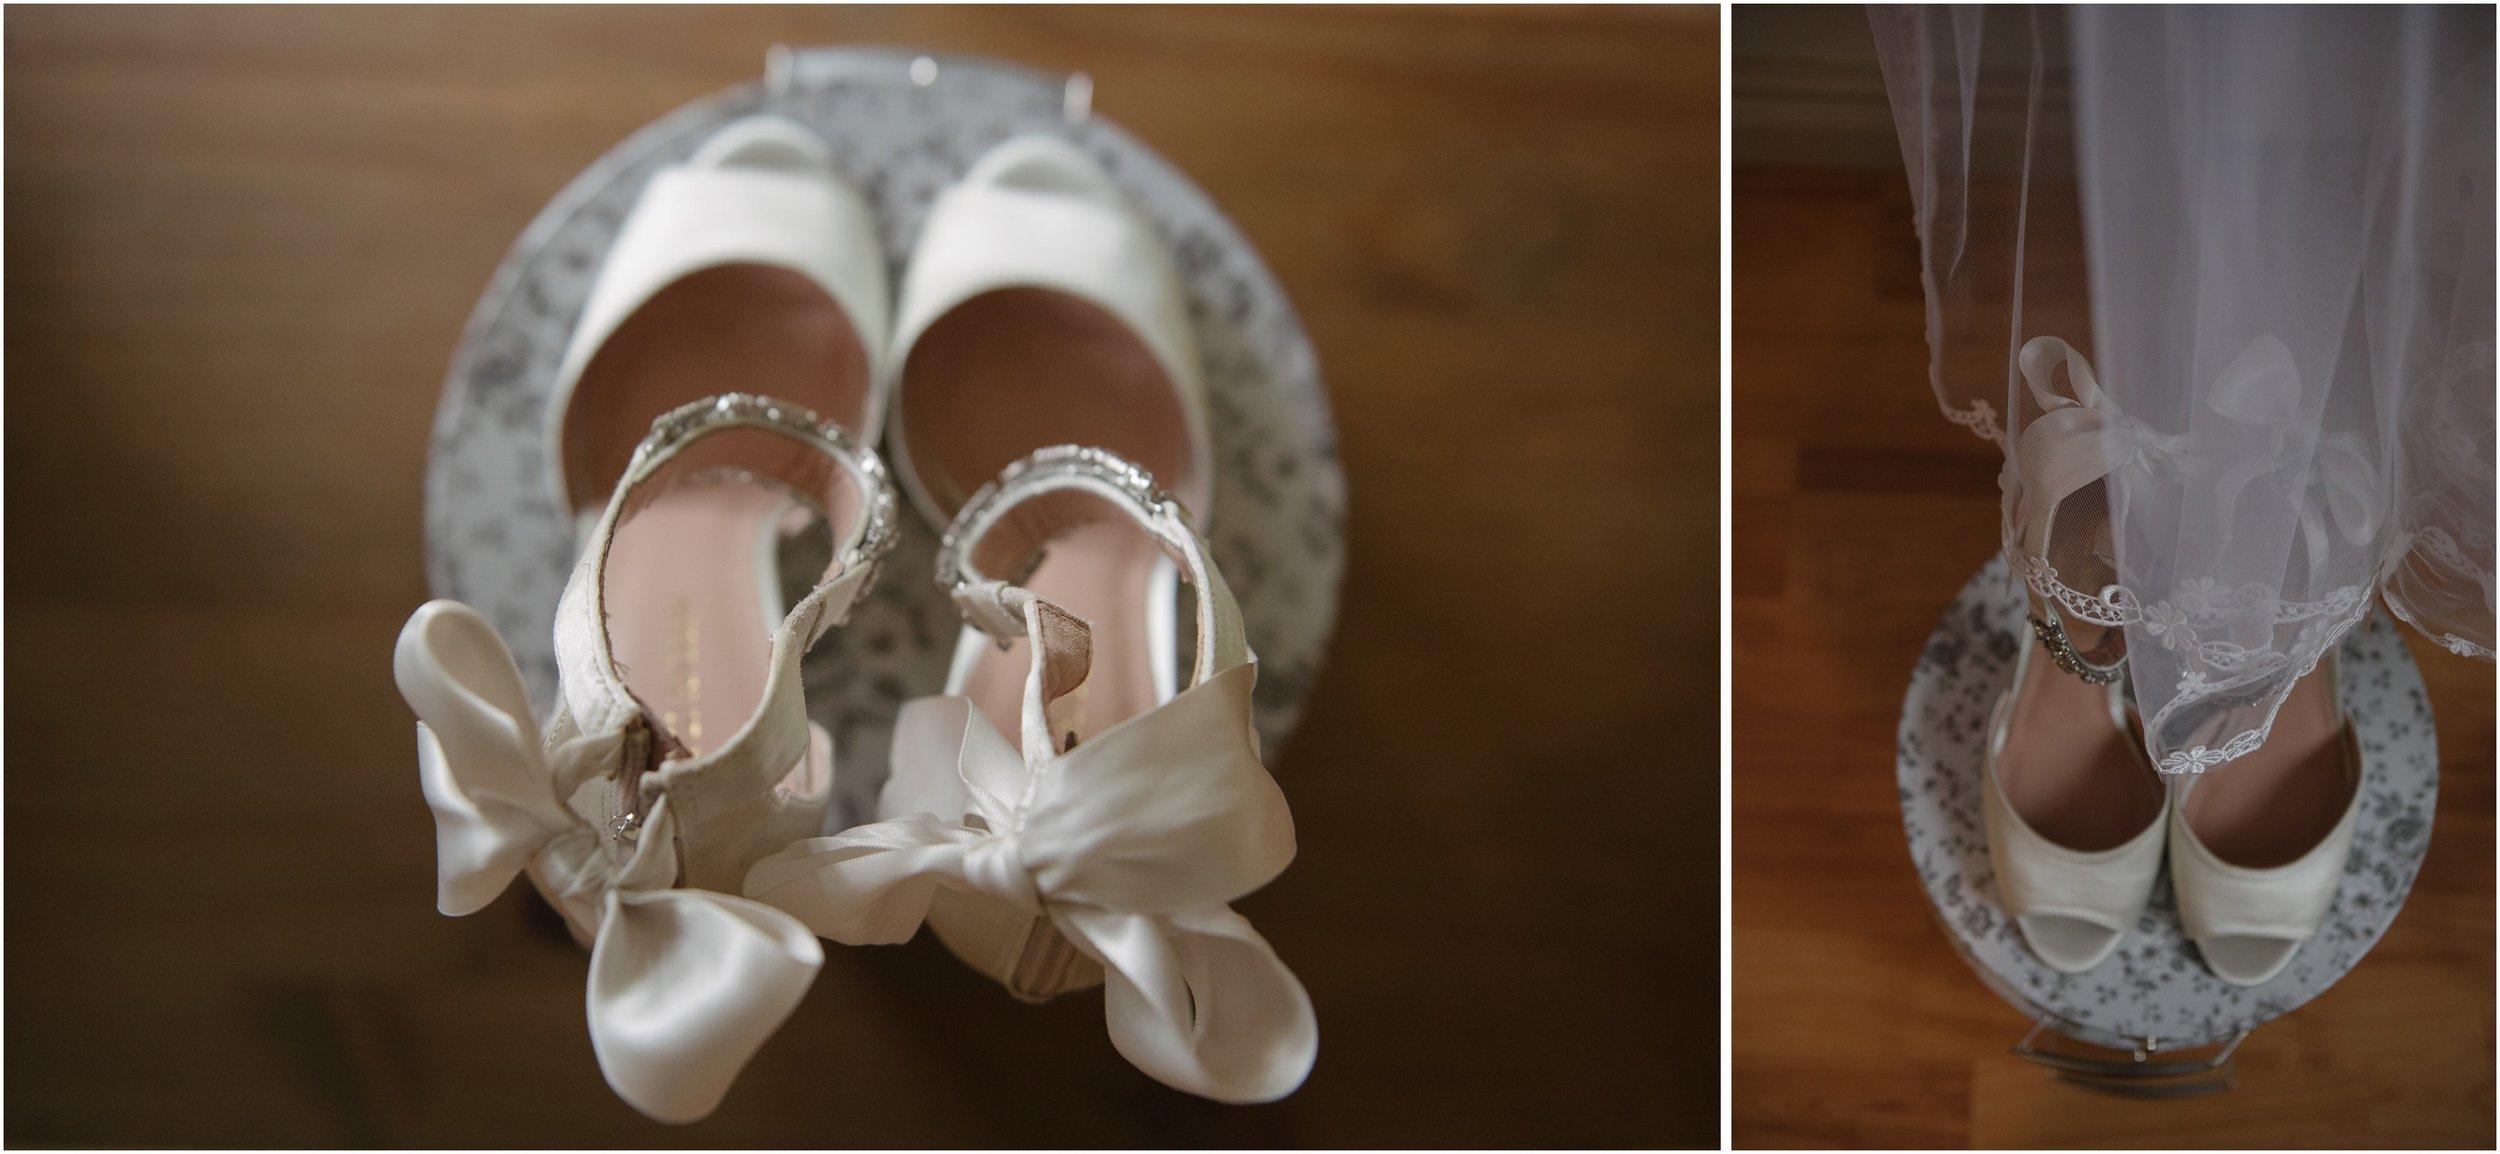 laura-lee-stephen-lough-erne-resort-wedding-photography-co-fermanagh_0004.jpg